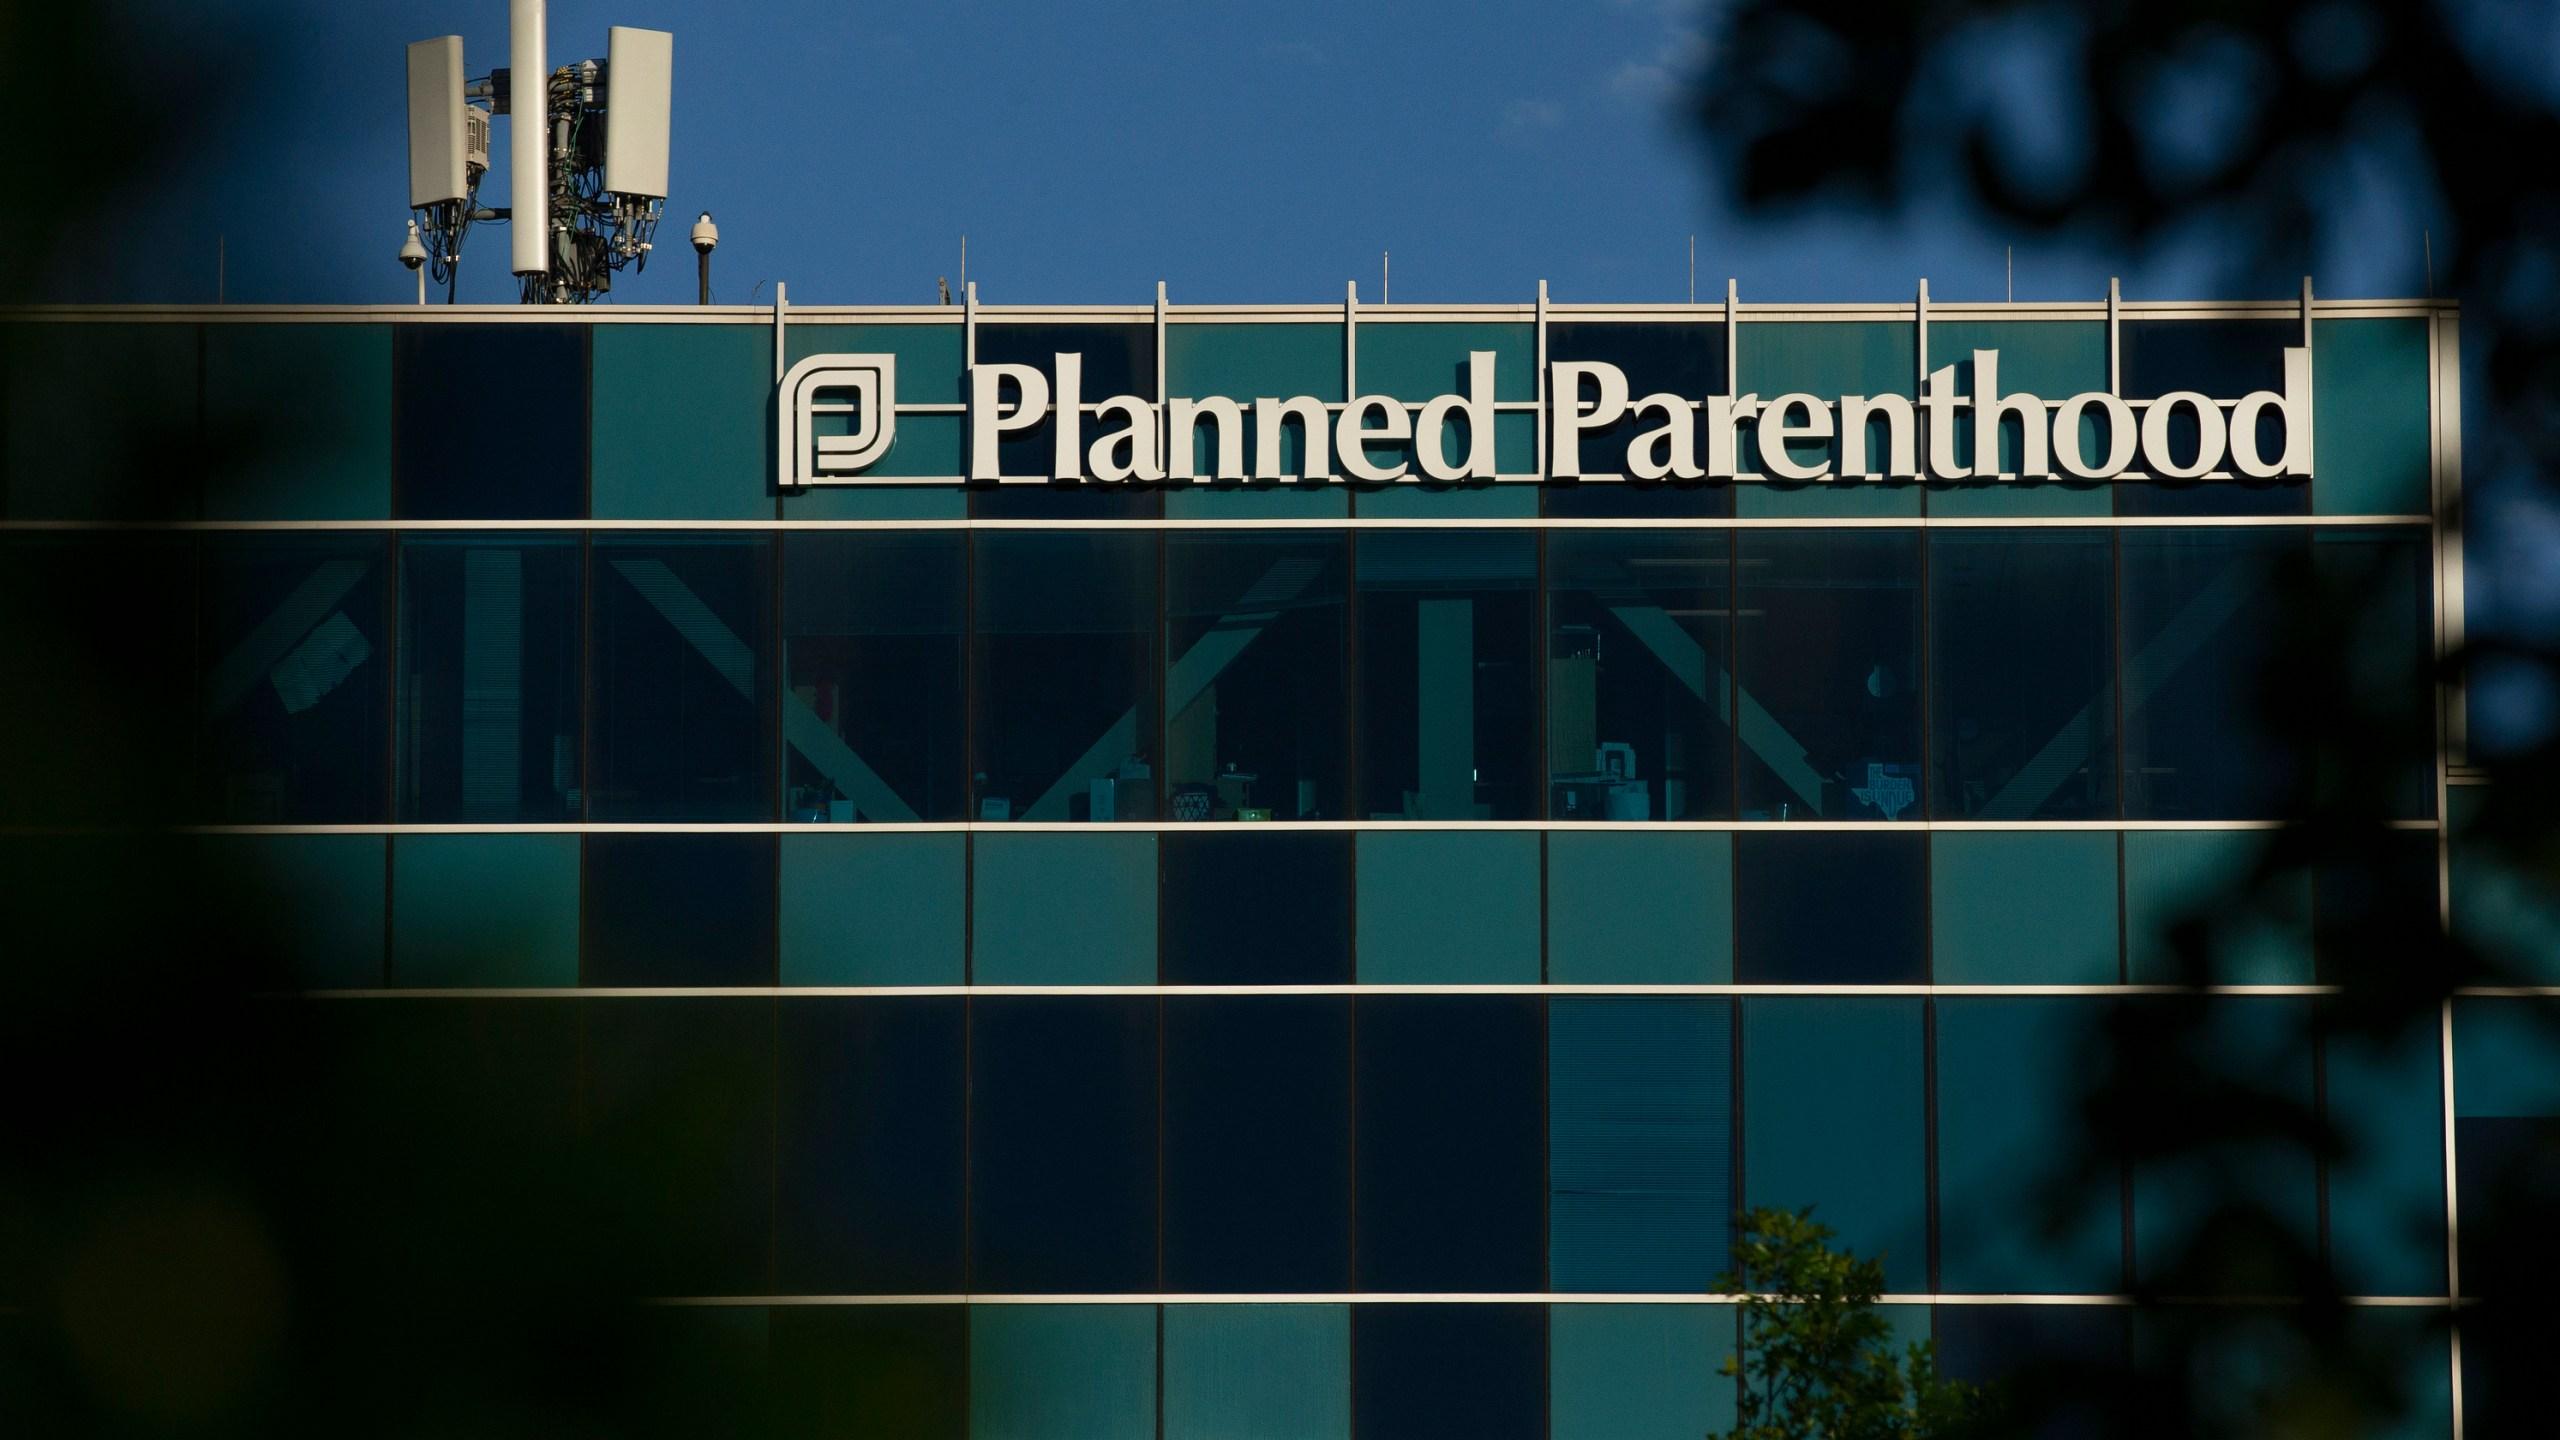 Planned_Parenthood_Texas_96778-159532.jpg04431798